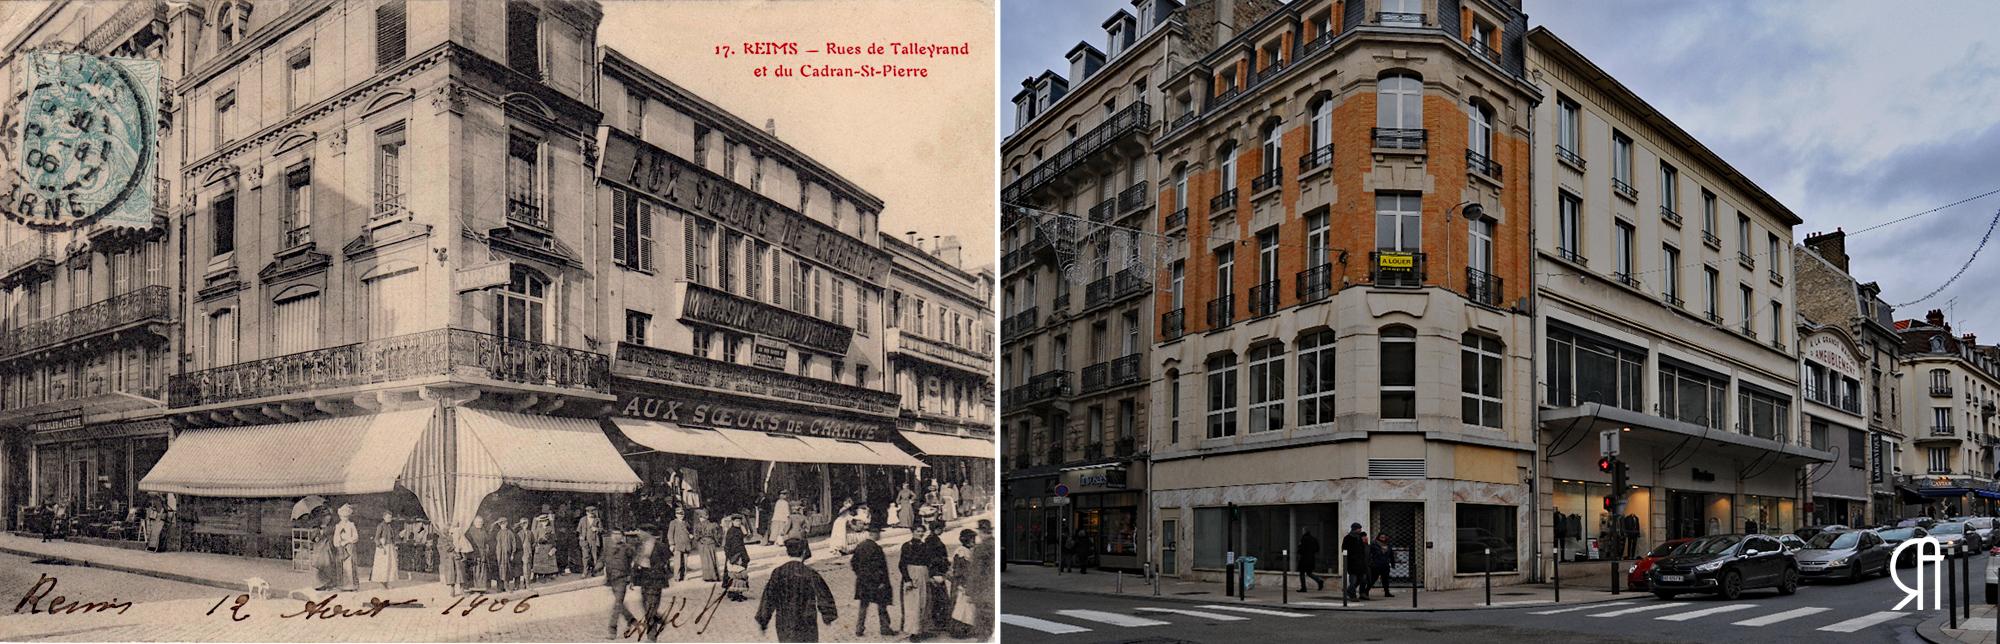 Angle de la rue de Talleyrand et de la rue du Cadran Saint-Pierre